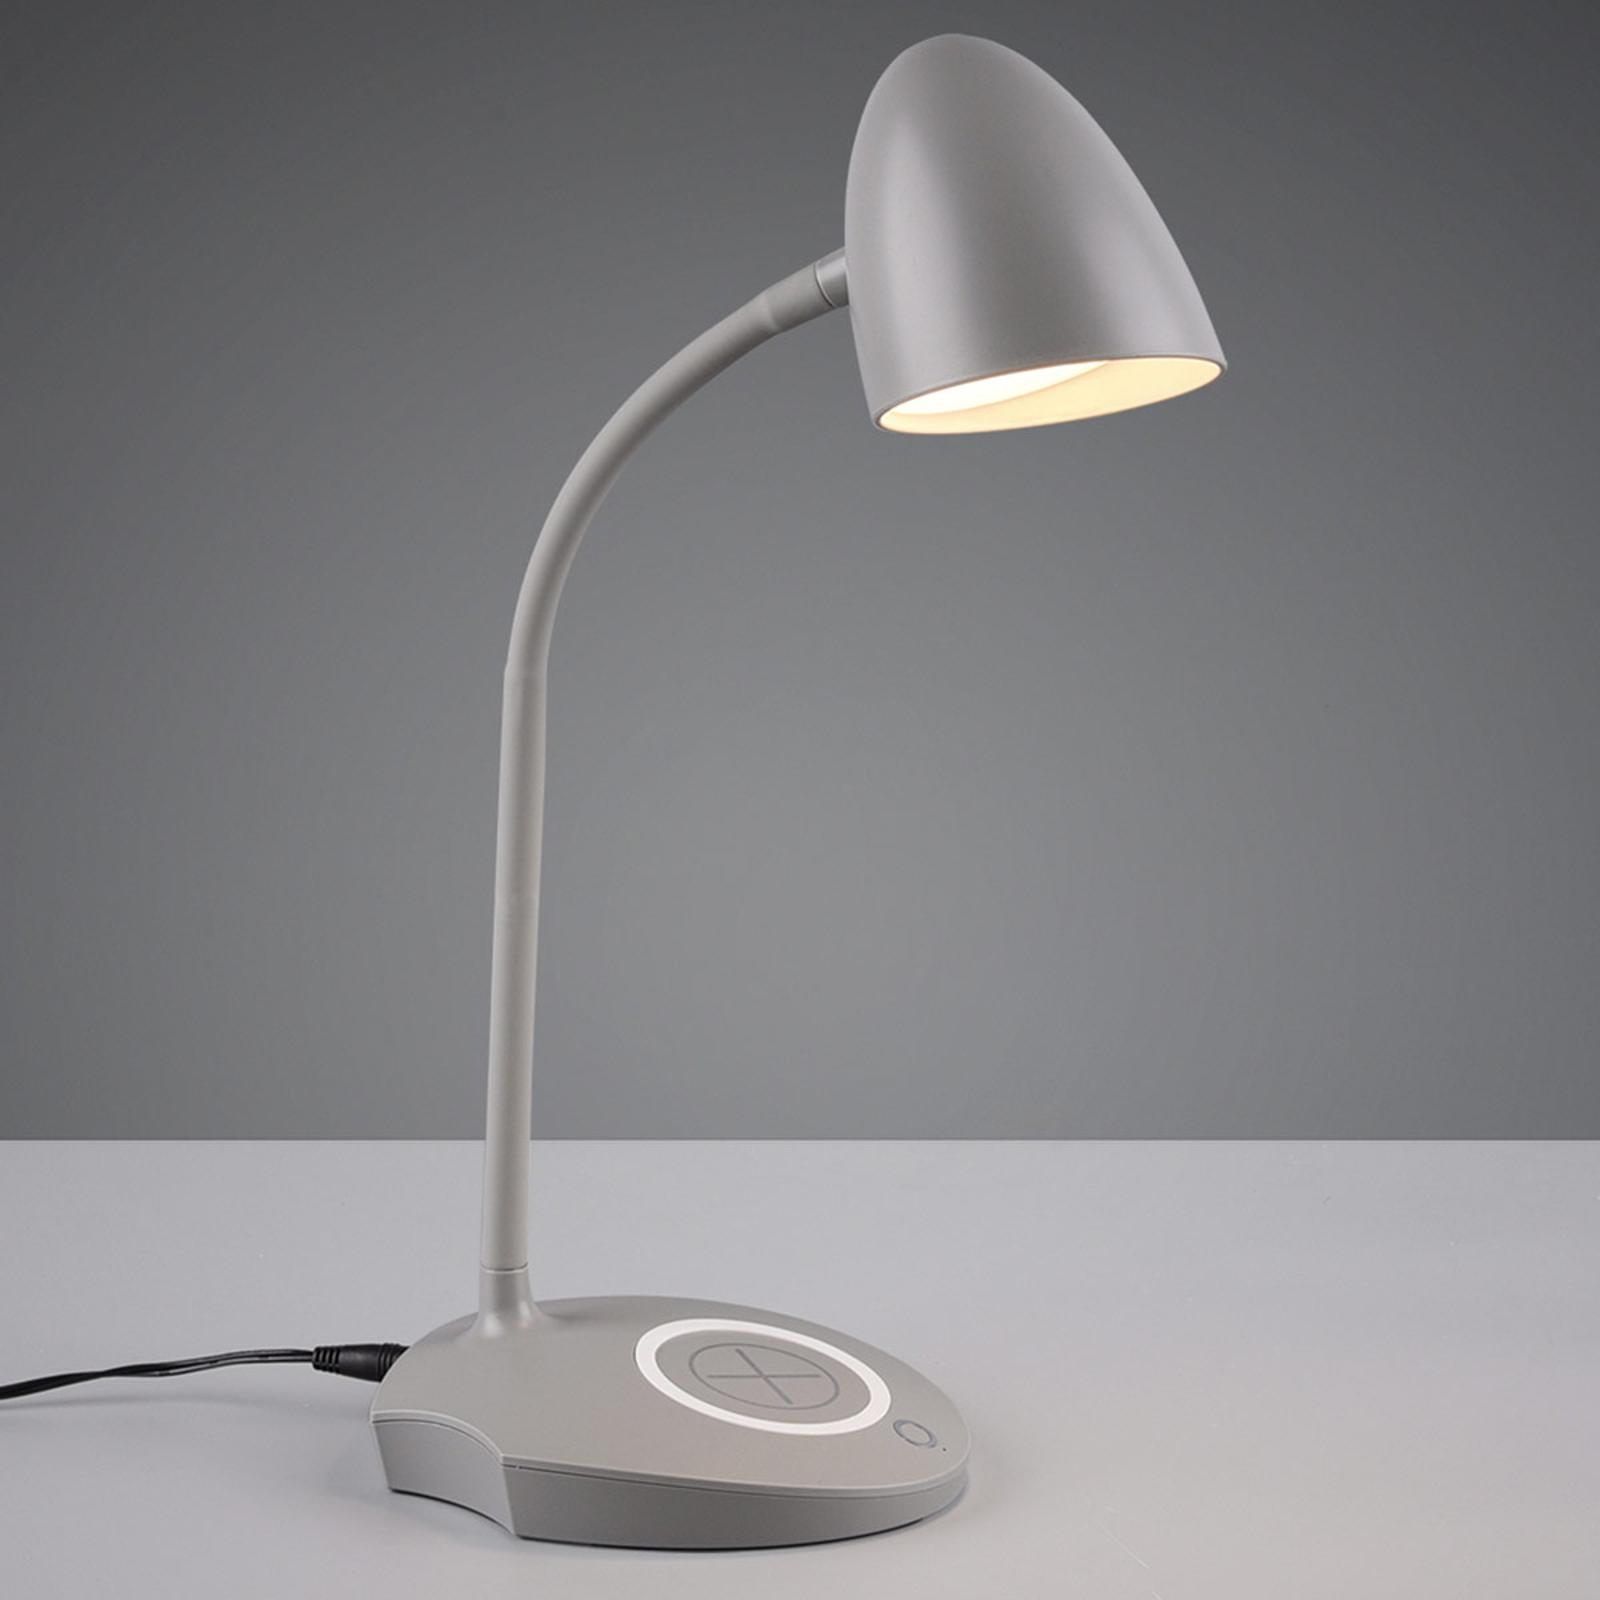 LED tafellamp Load, inductief laadstation, grijs